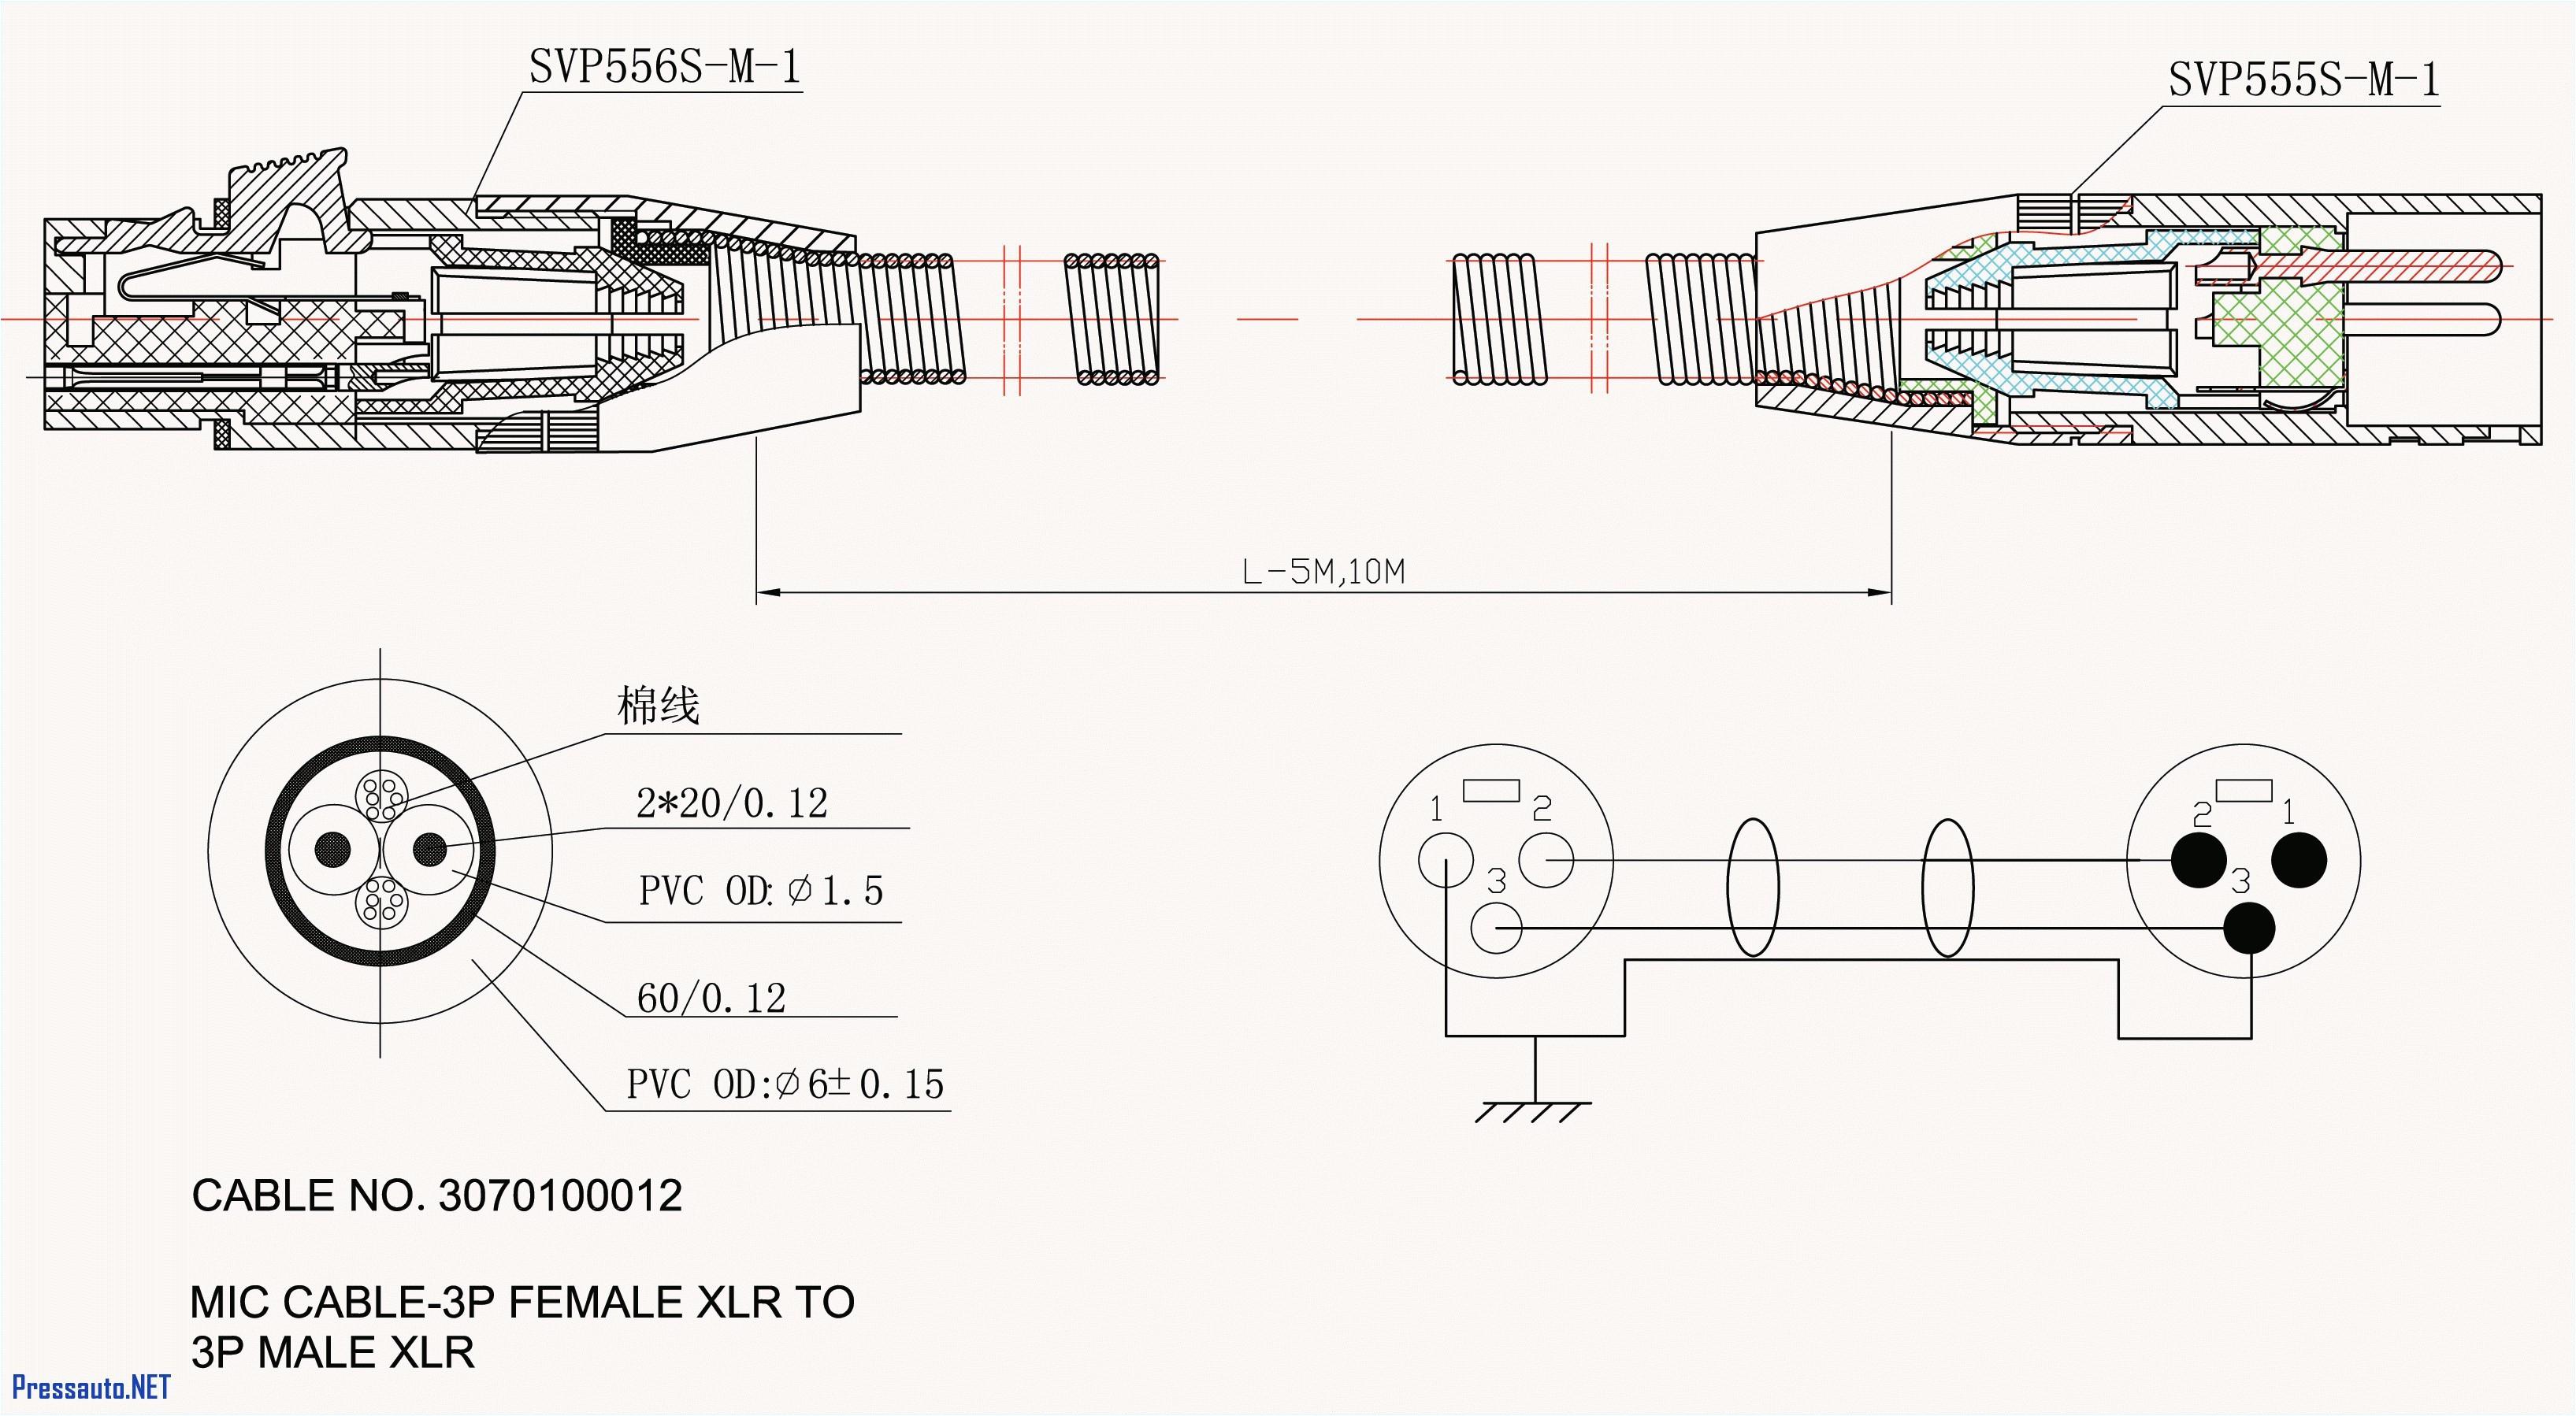 rb25 alternator wiring diagram inspirationa marine mando of 10